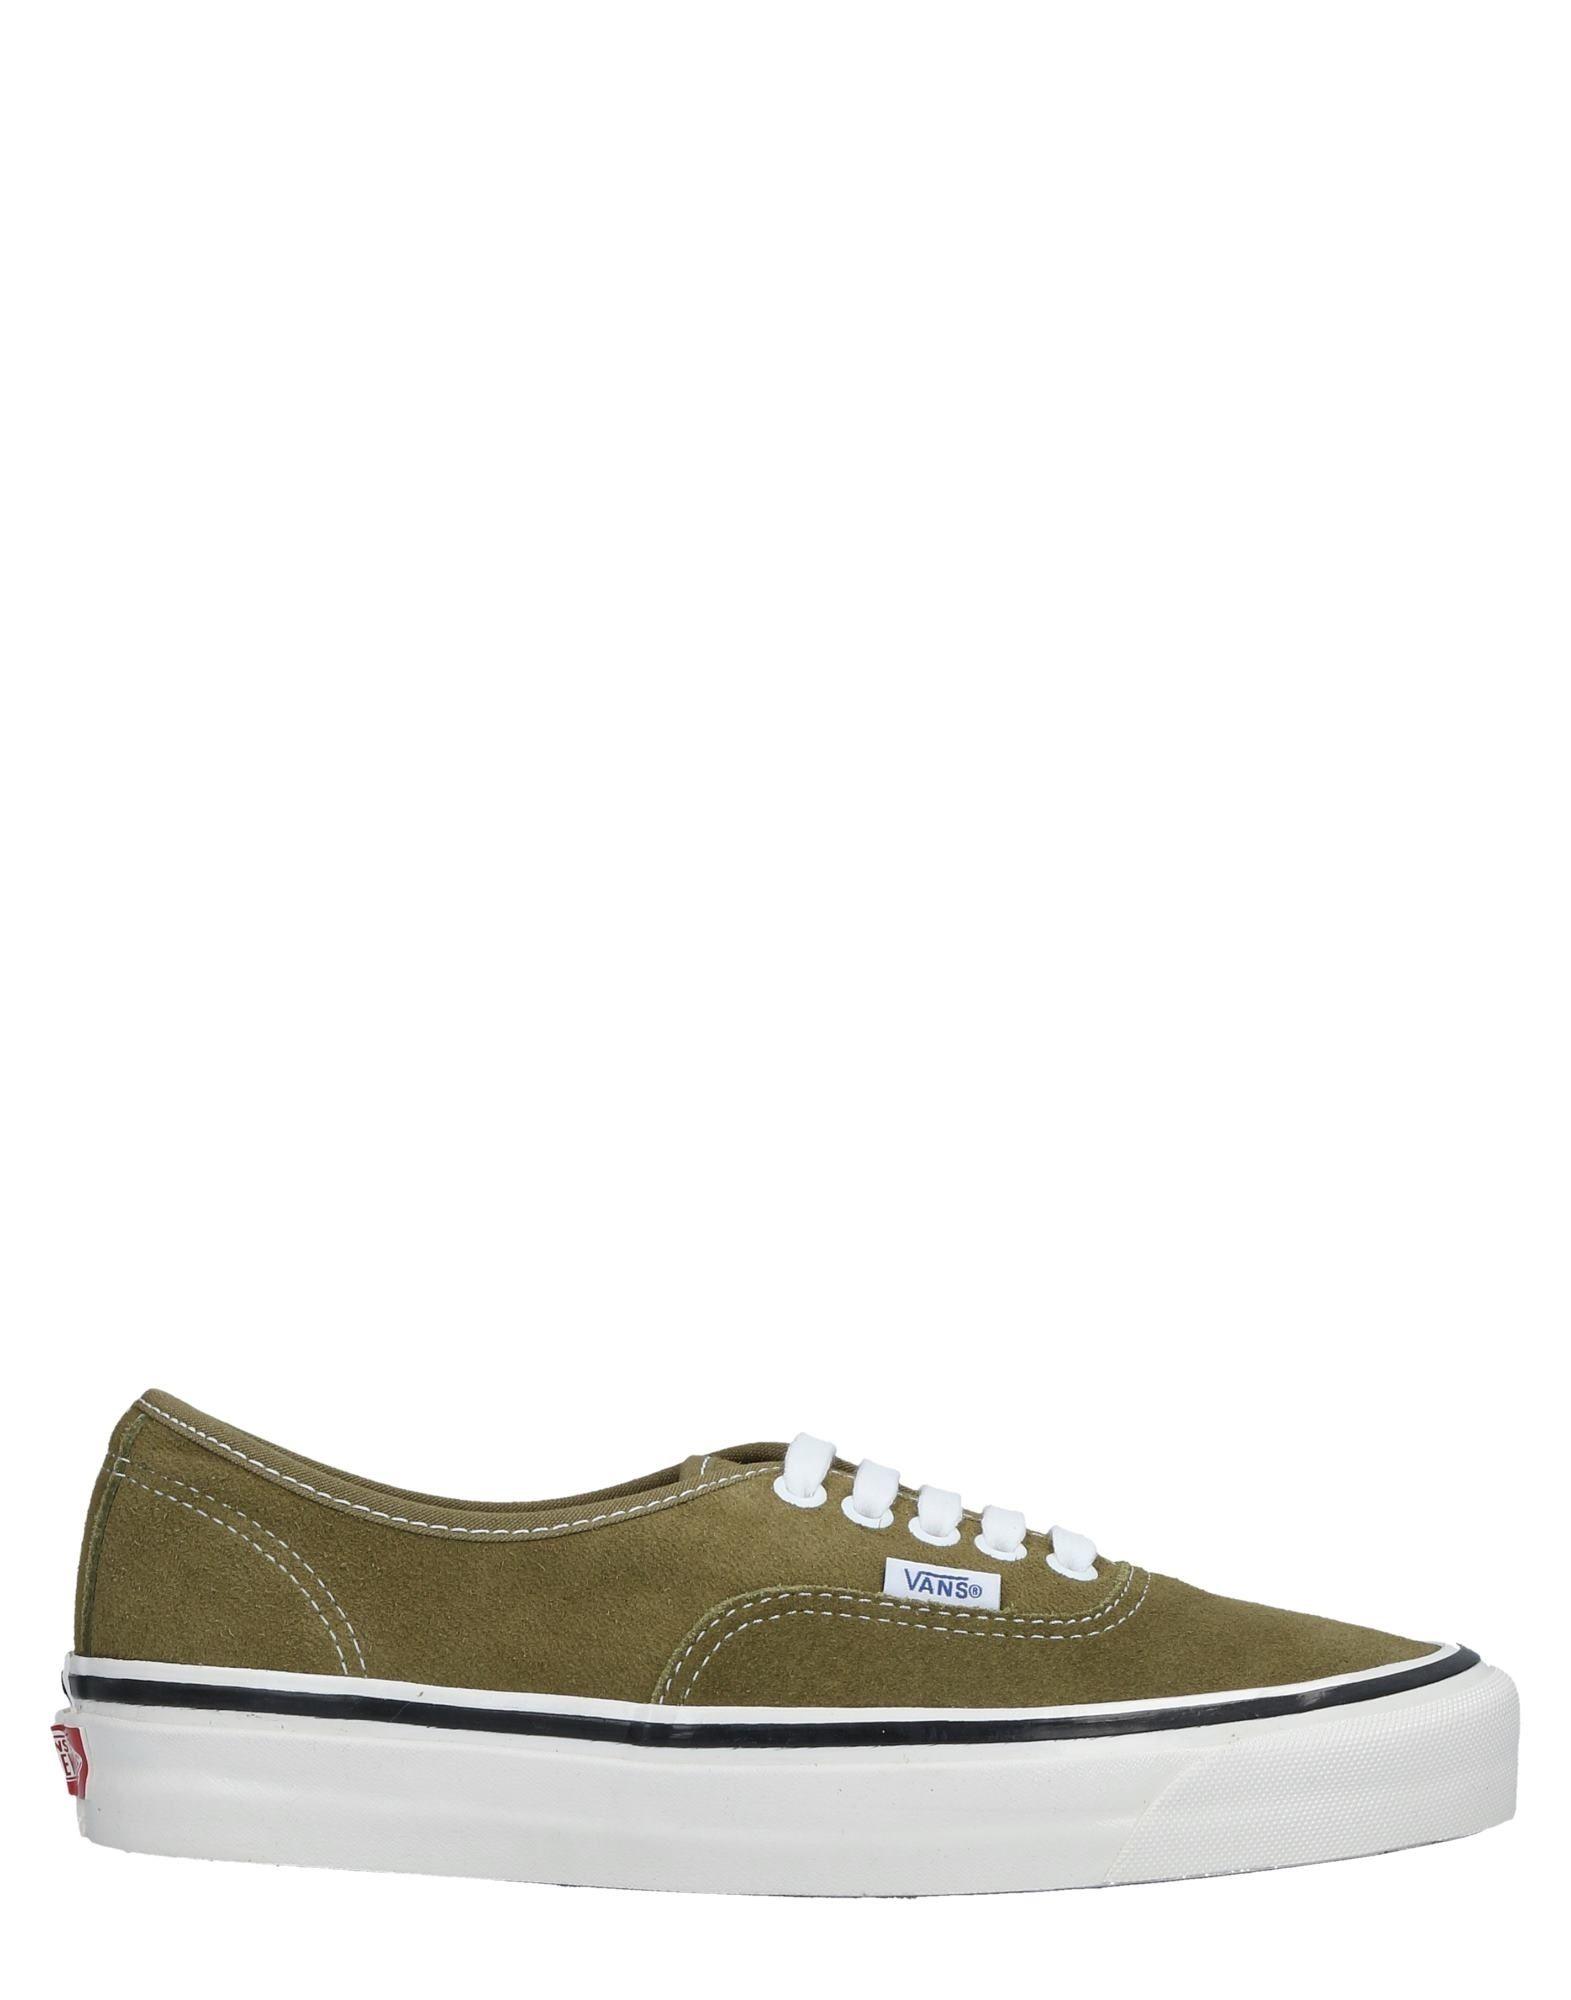 Vans Sneakers Damen Damen Sneakers  11518825BW Gute Qualität beliebte Schuhe 51b970